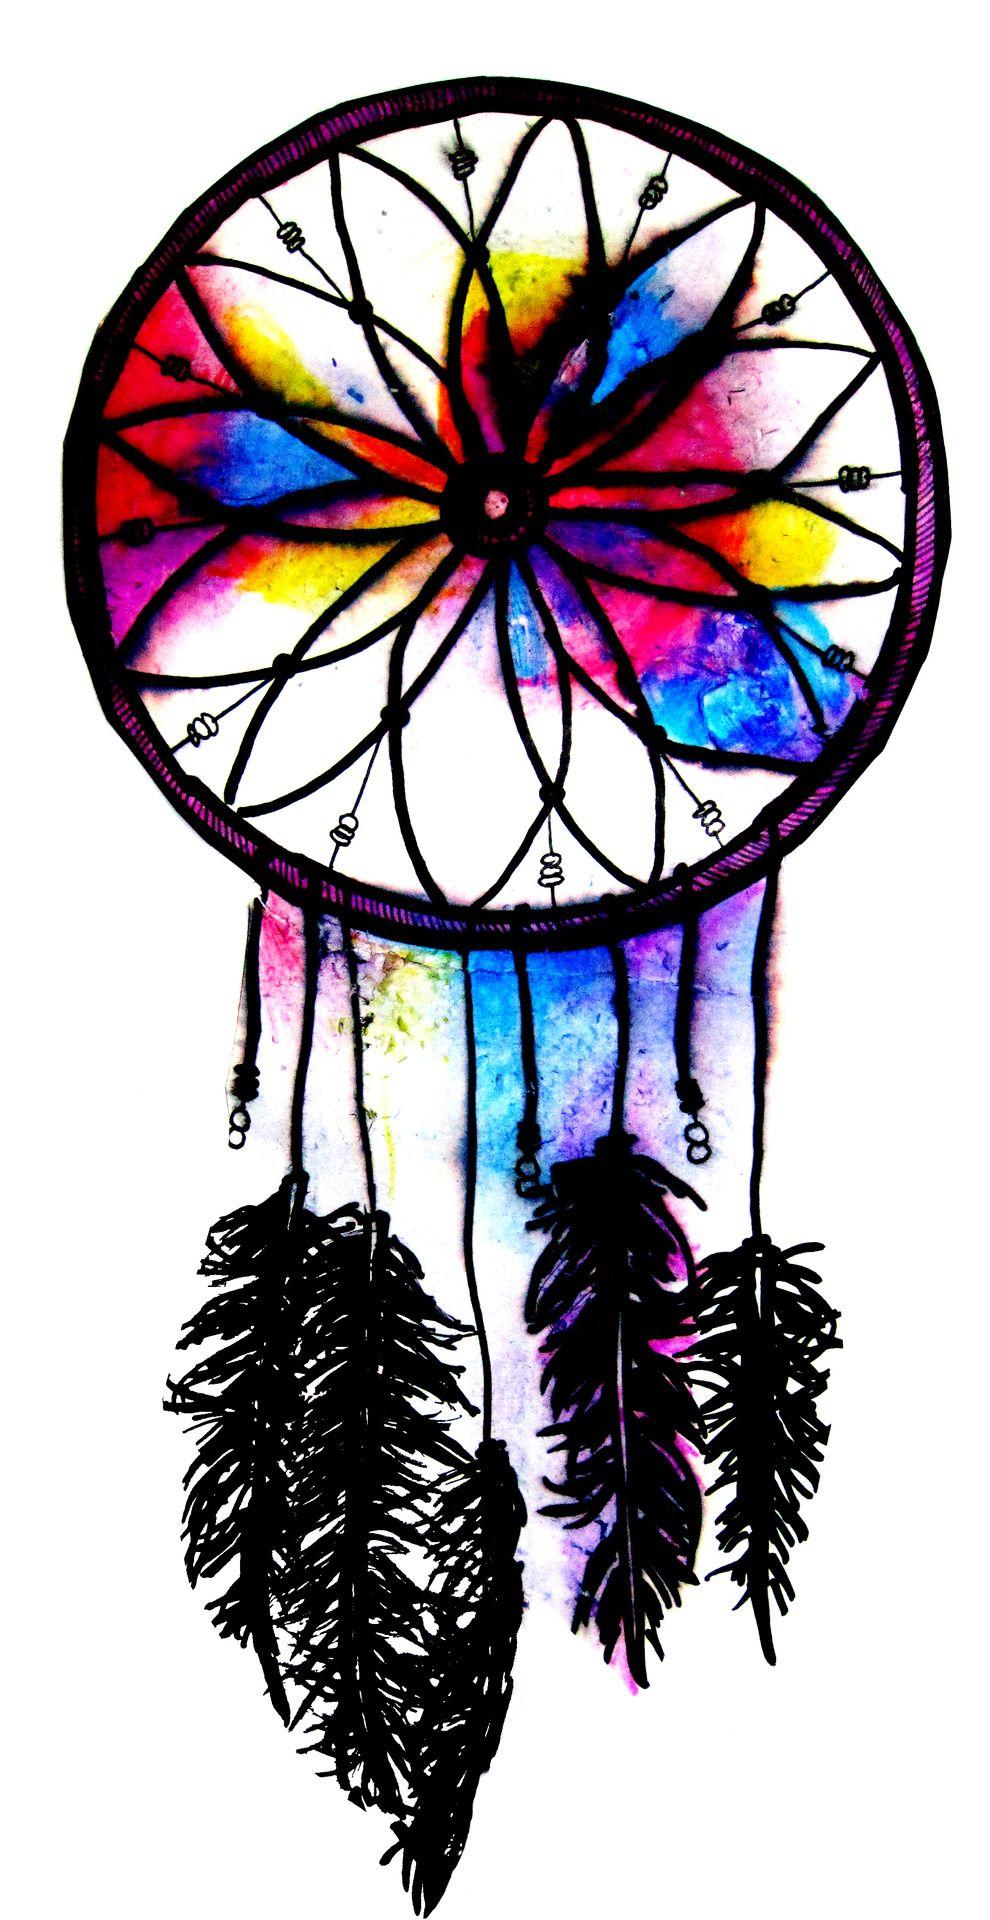 Rainbow Dream Catcher | Interesting Tattoos | Pinterest ...